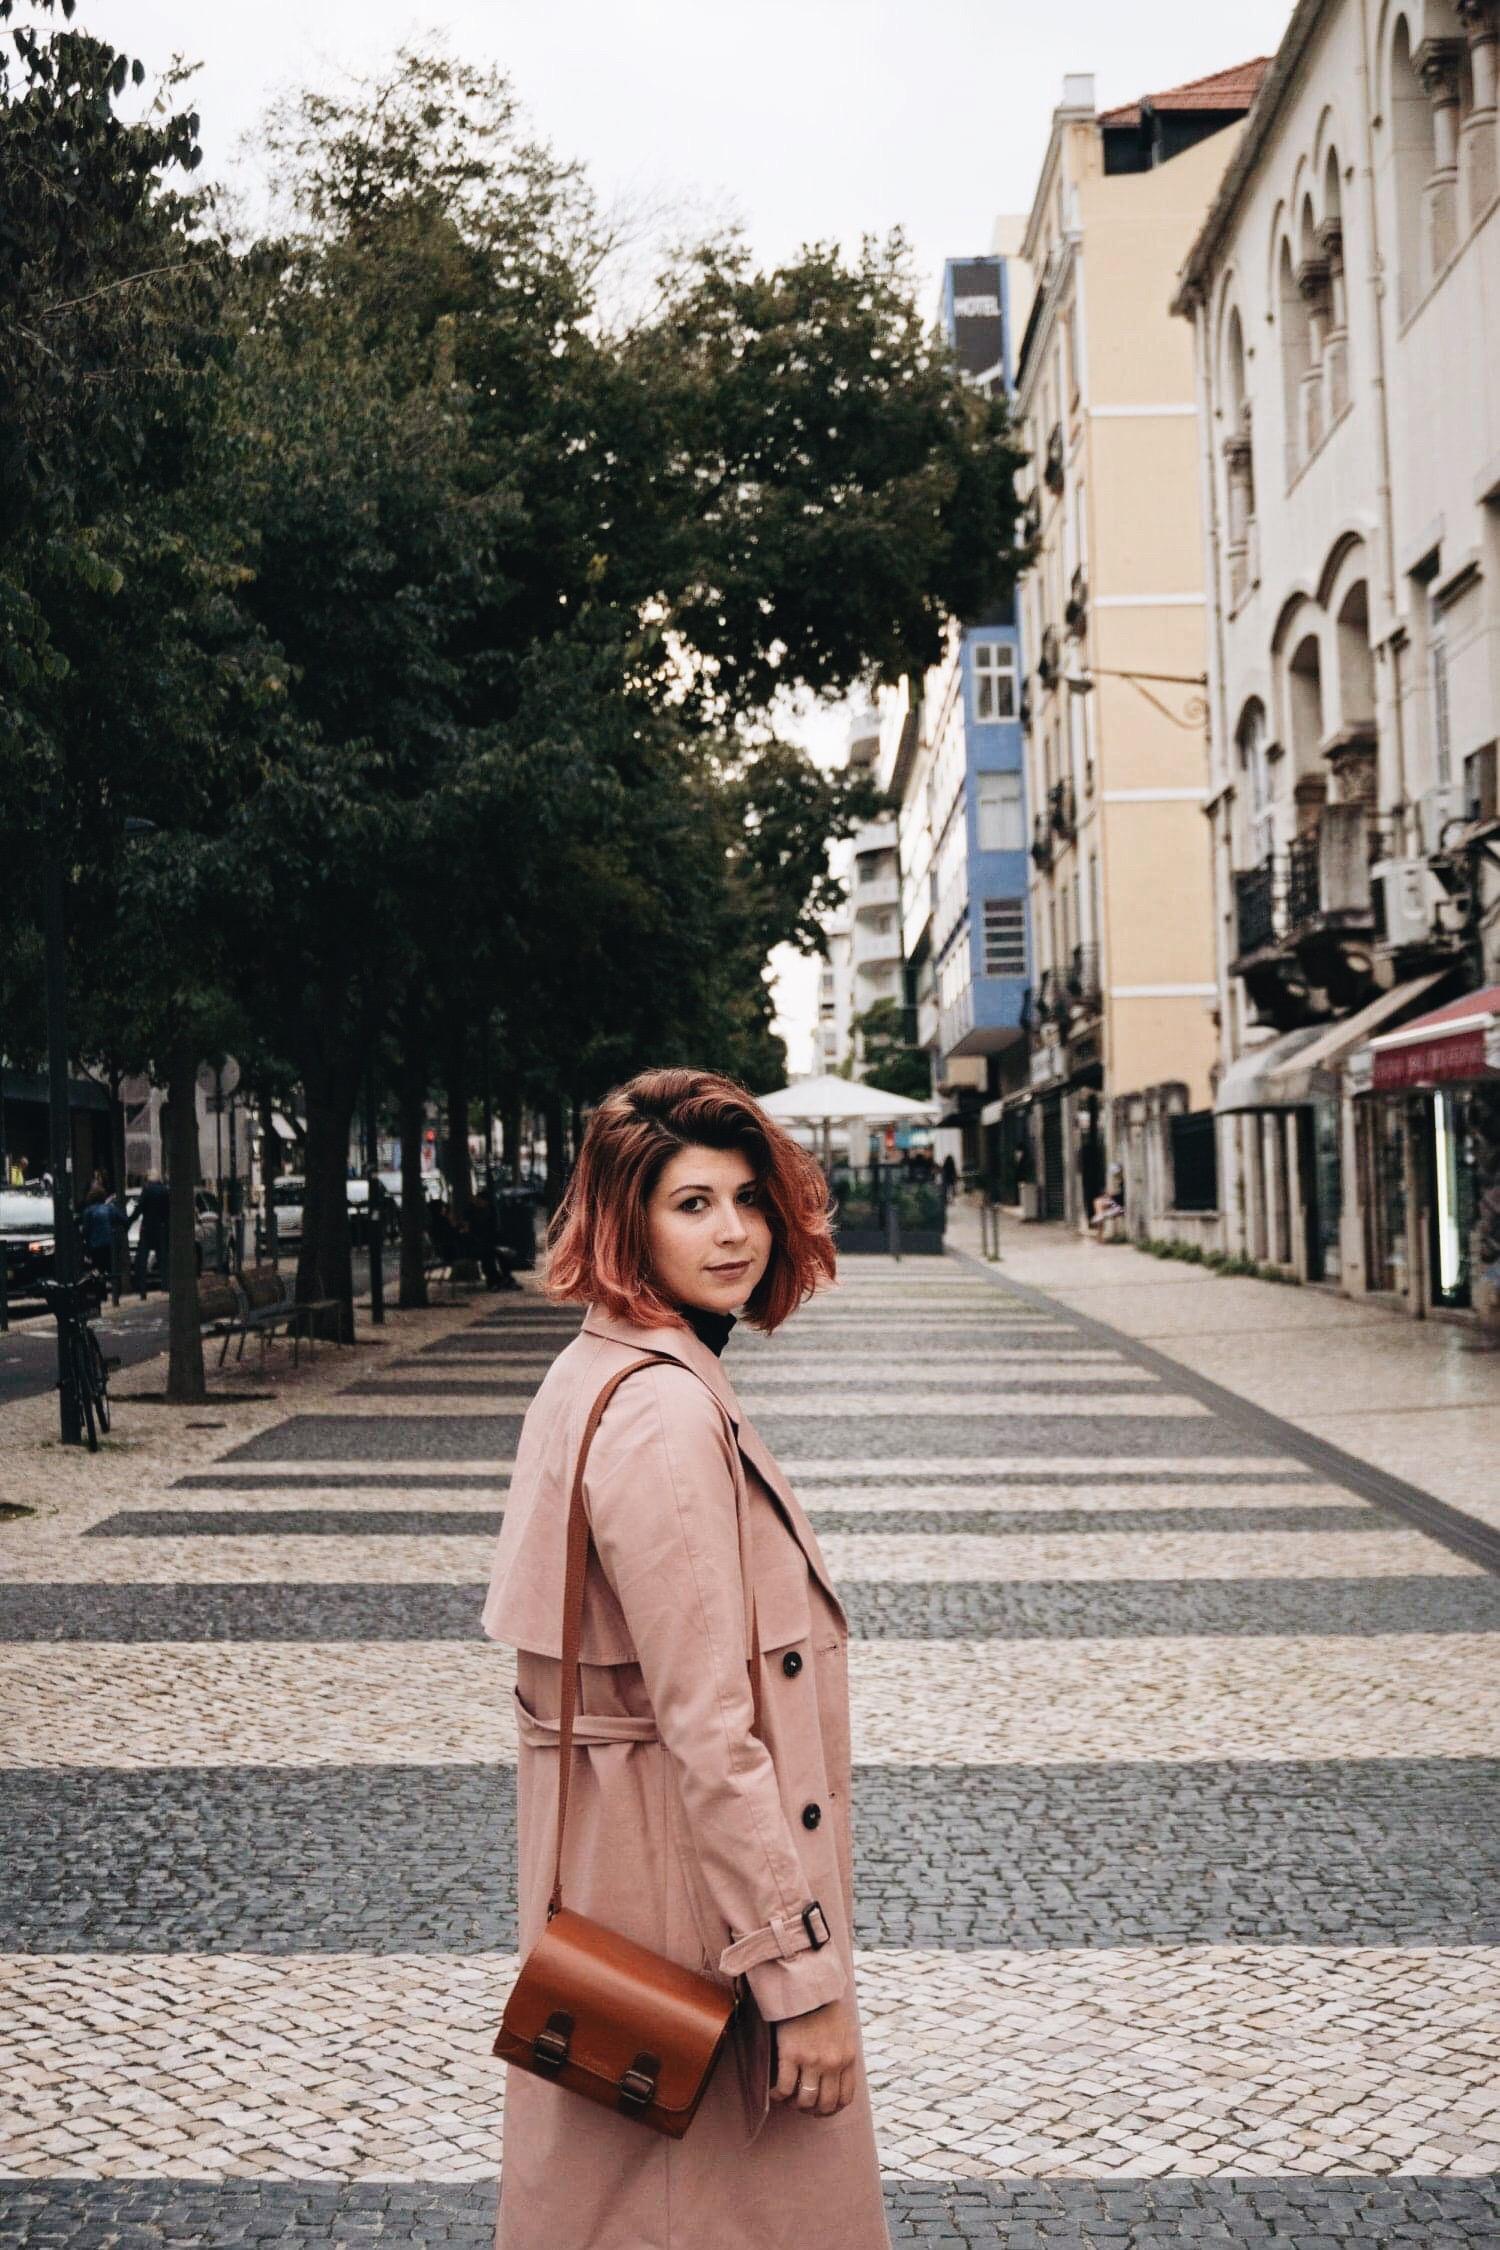 Saldanha-Lisbona